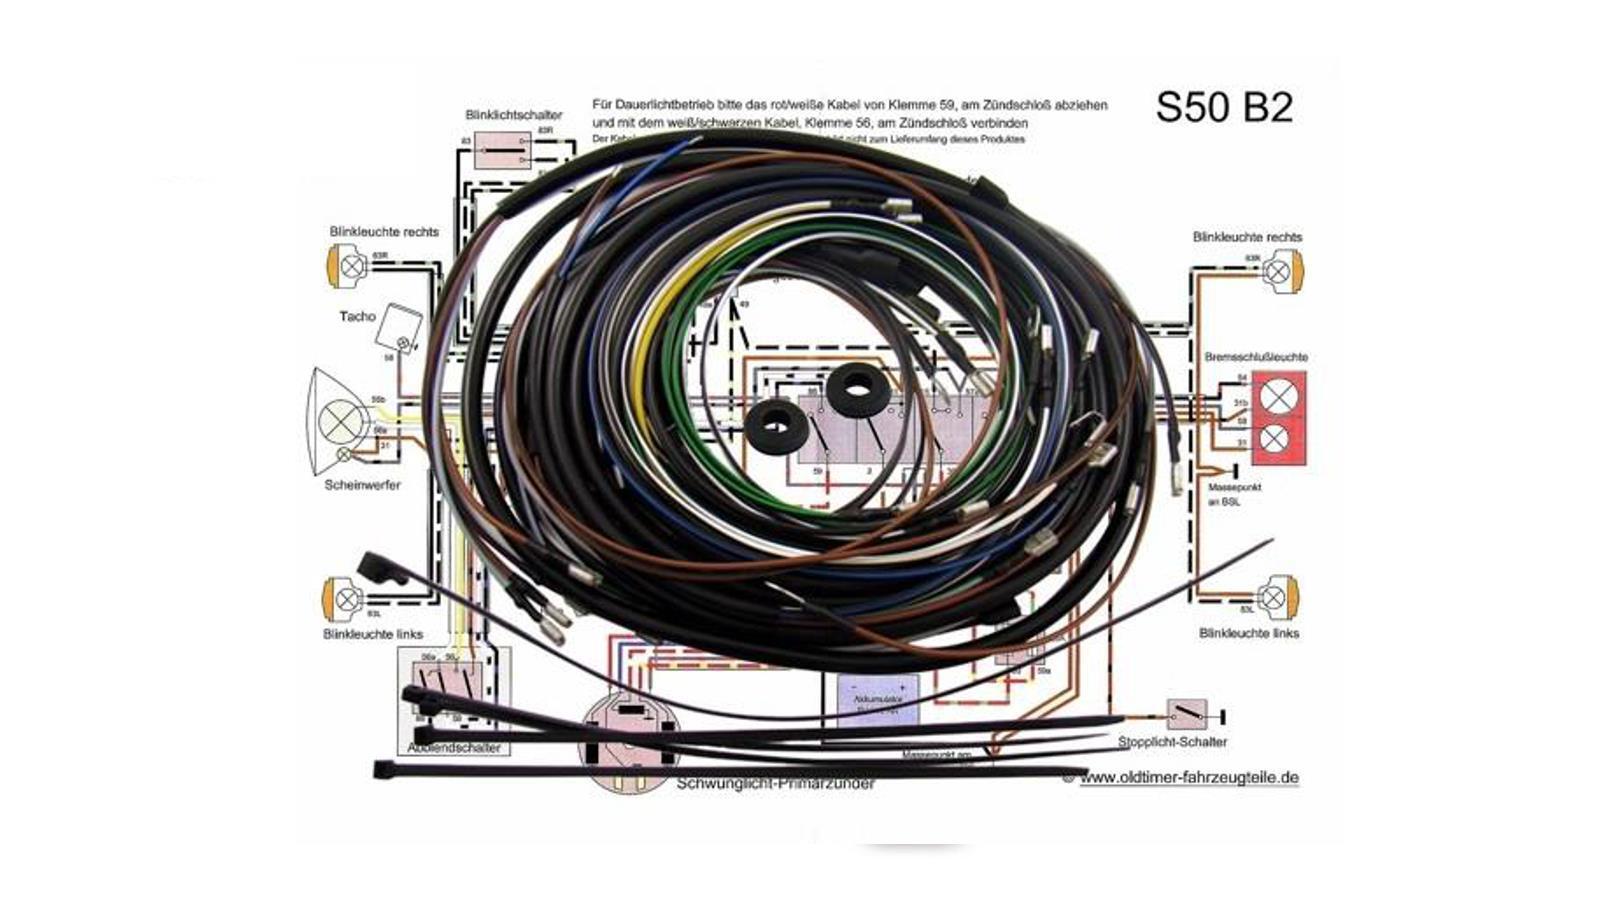 Berühmt Tachoschaltplan Kabel Fotos - Elektrische Schaltplan-Ideen ...